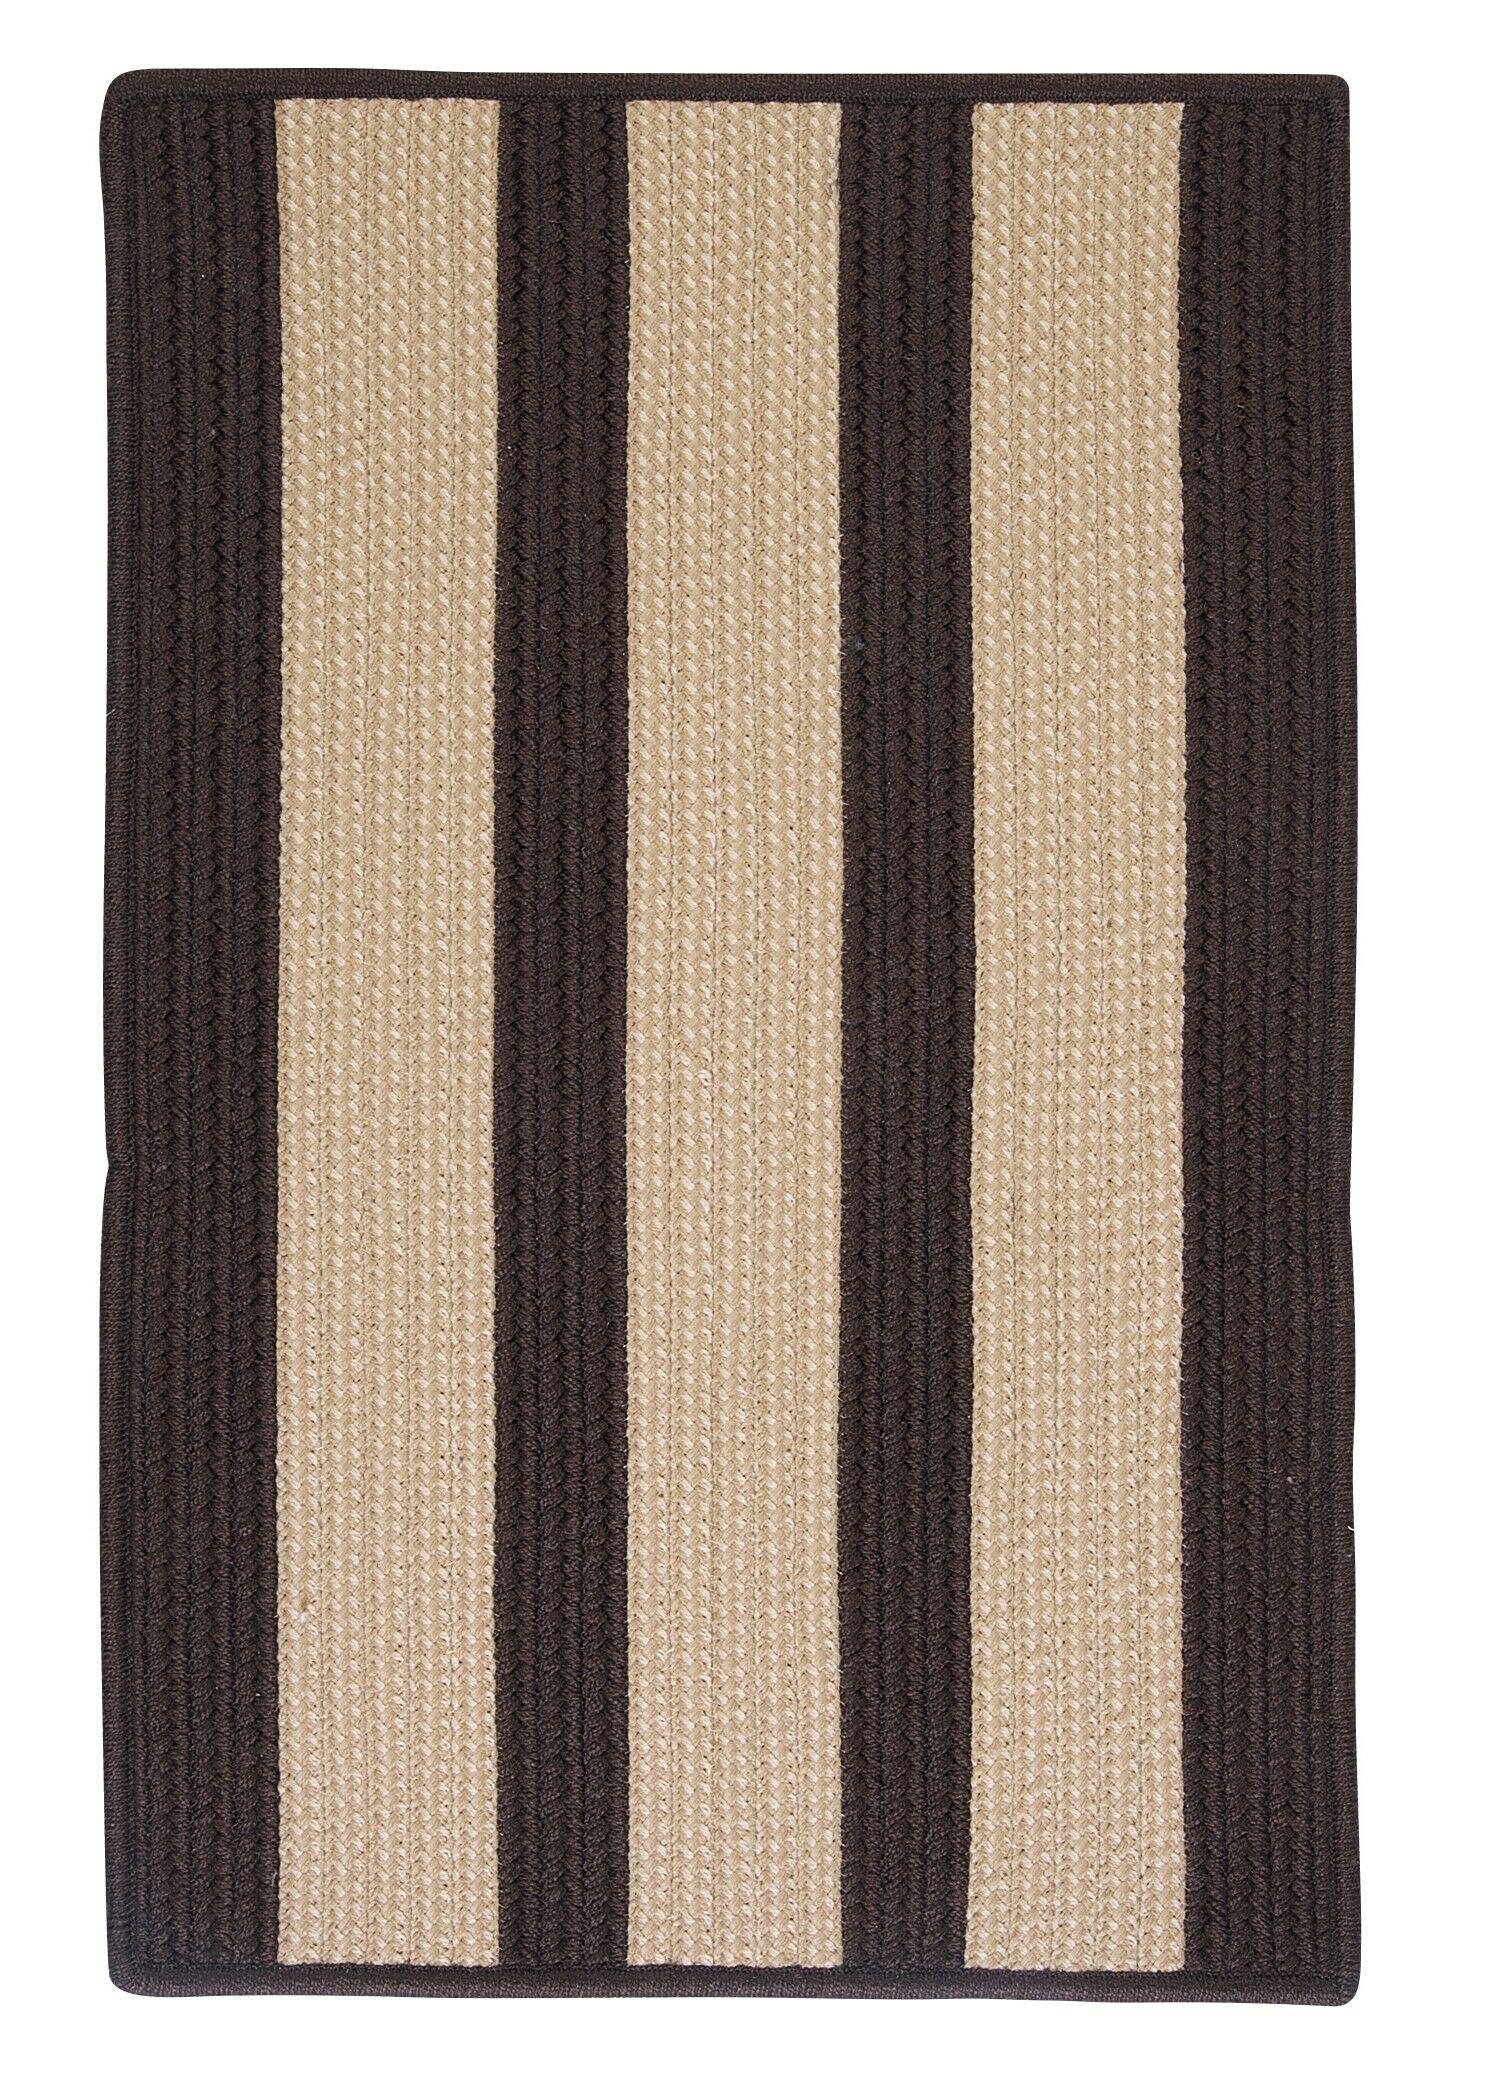 Seal Harbor Brown Indoor/Outdoor Area Rug Rug Size: Rectangle 4' x 6'